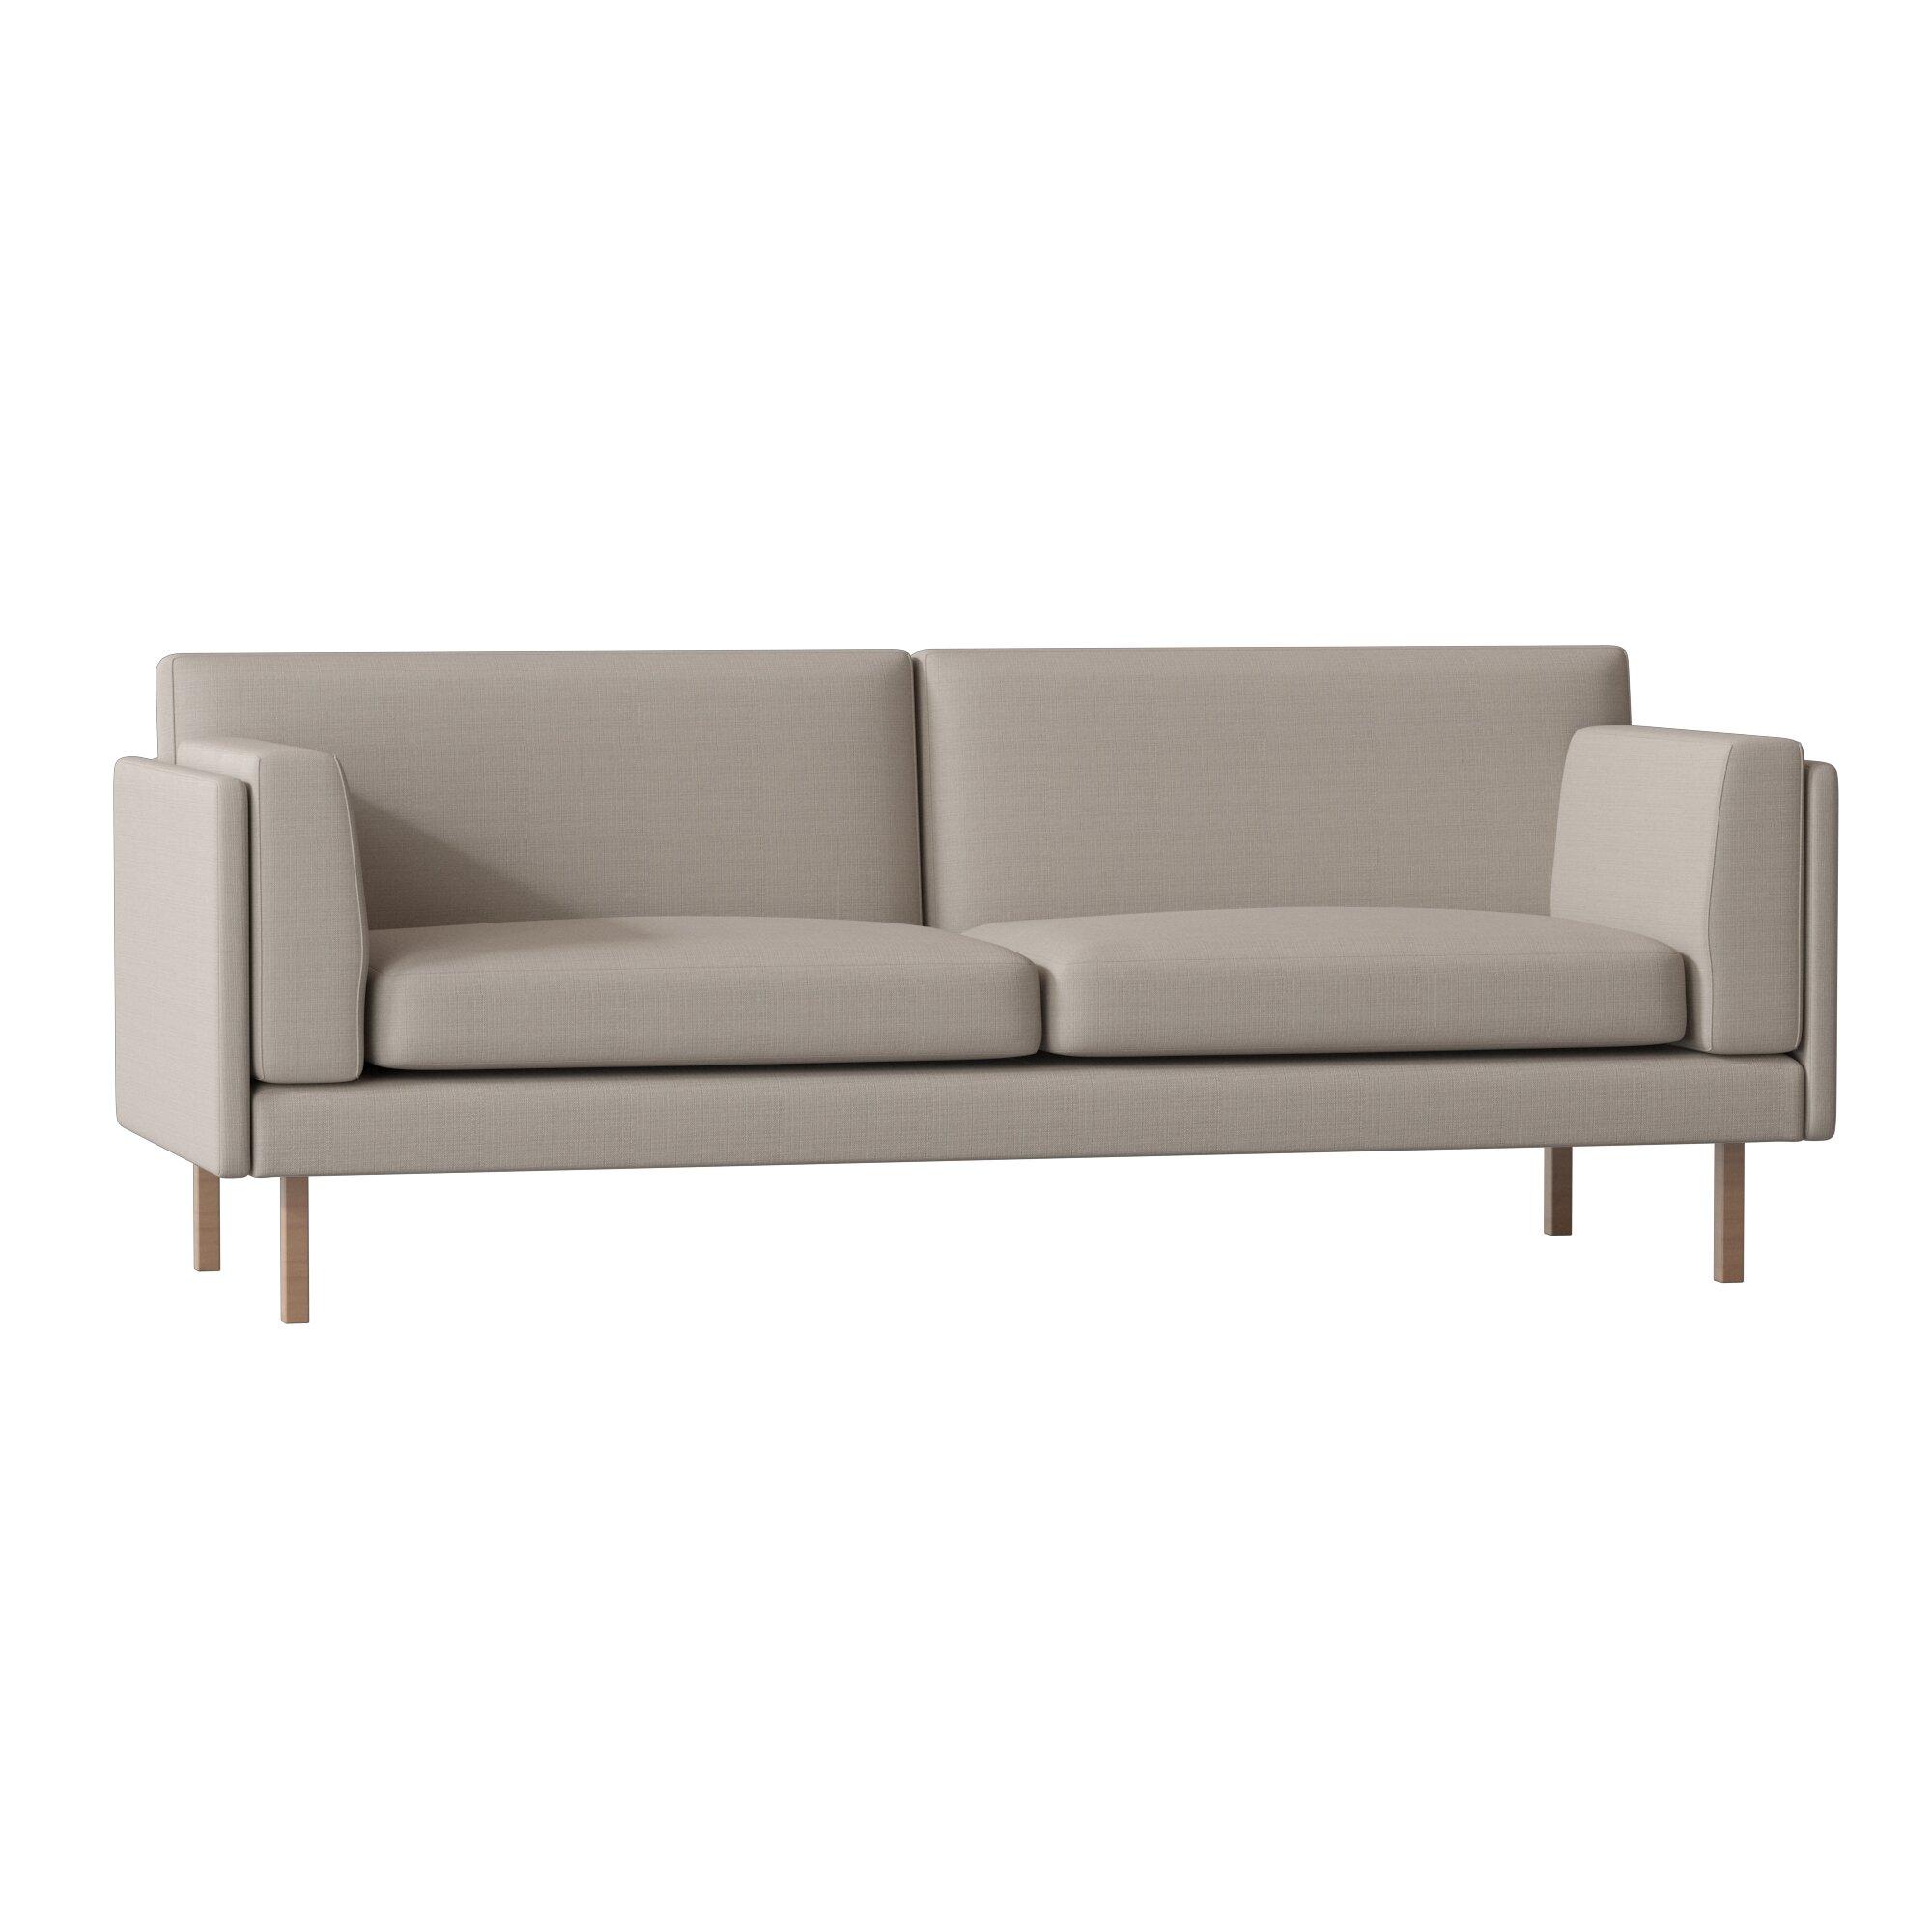 Superieur BenchMade Modern Skinny Fat Condo Sofa | Wayfair